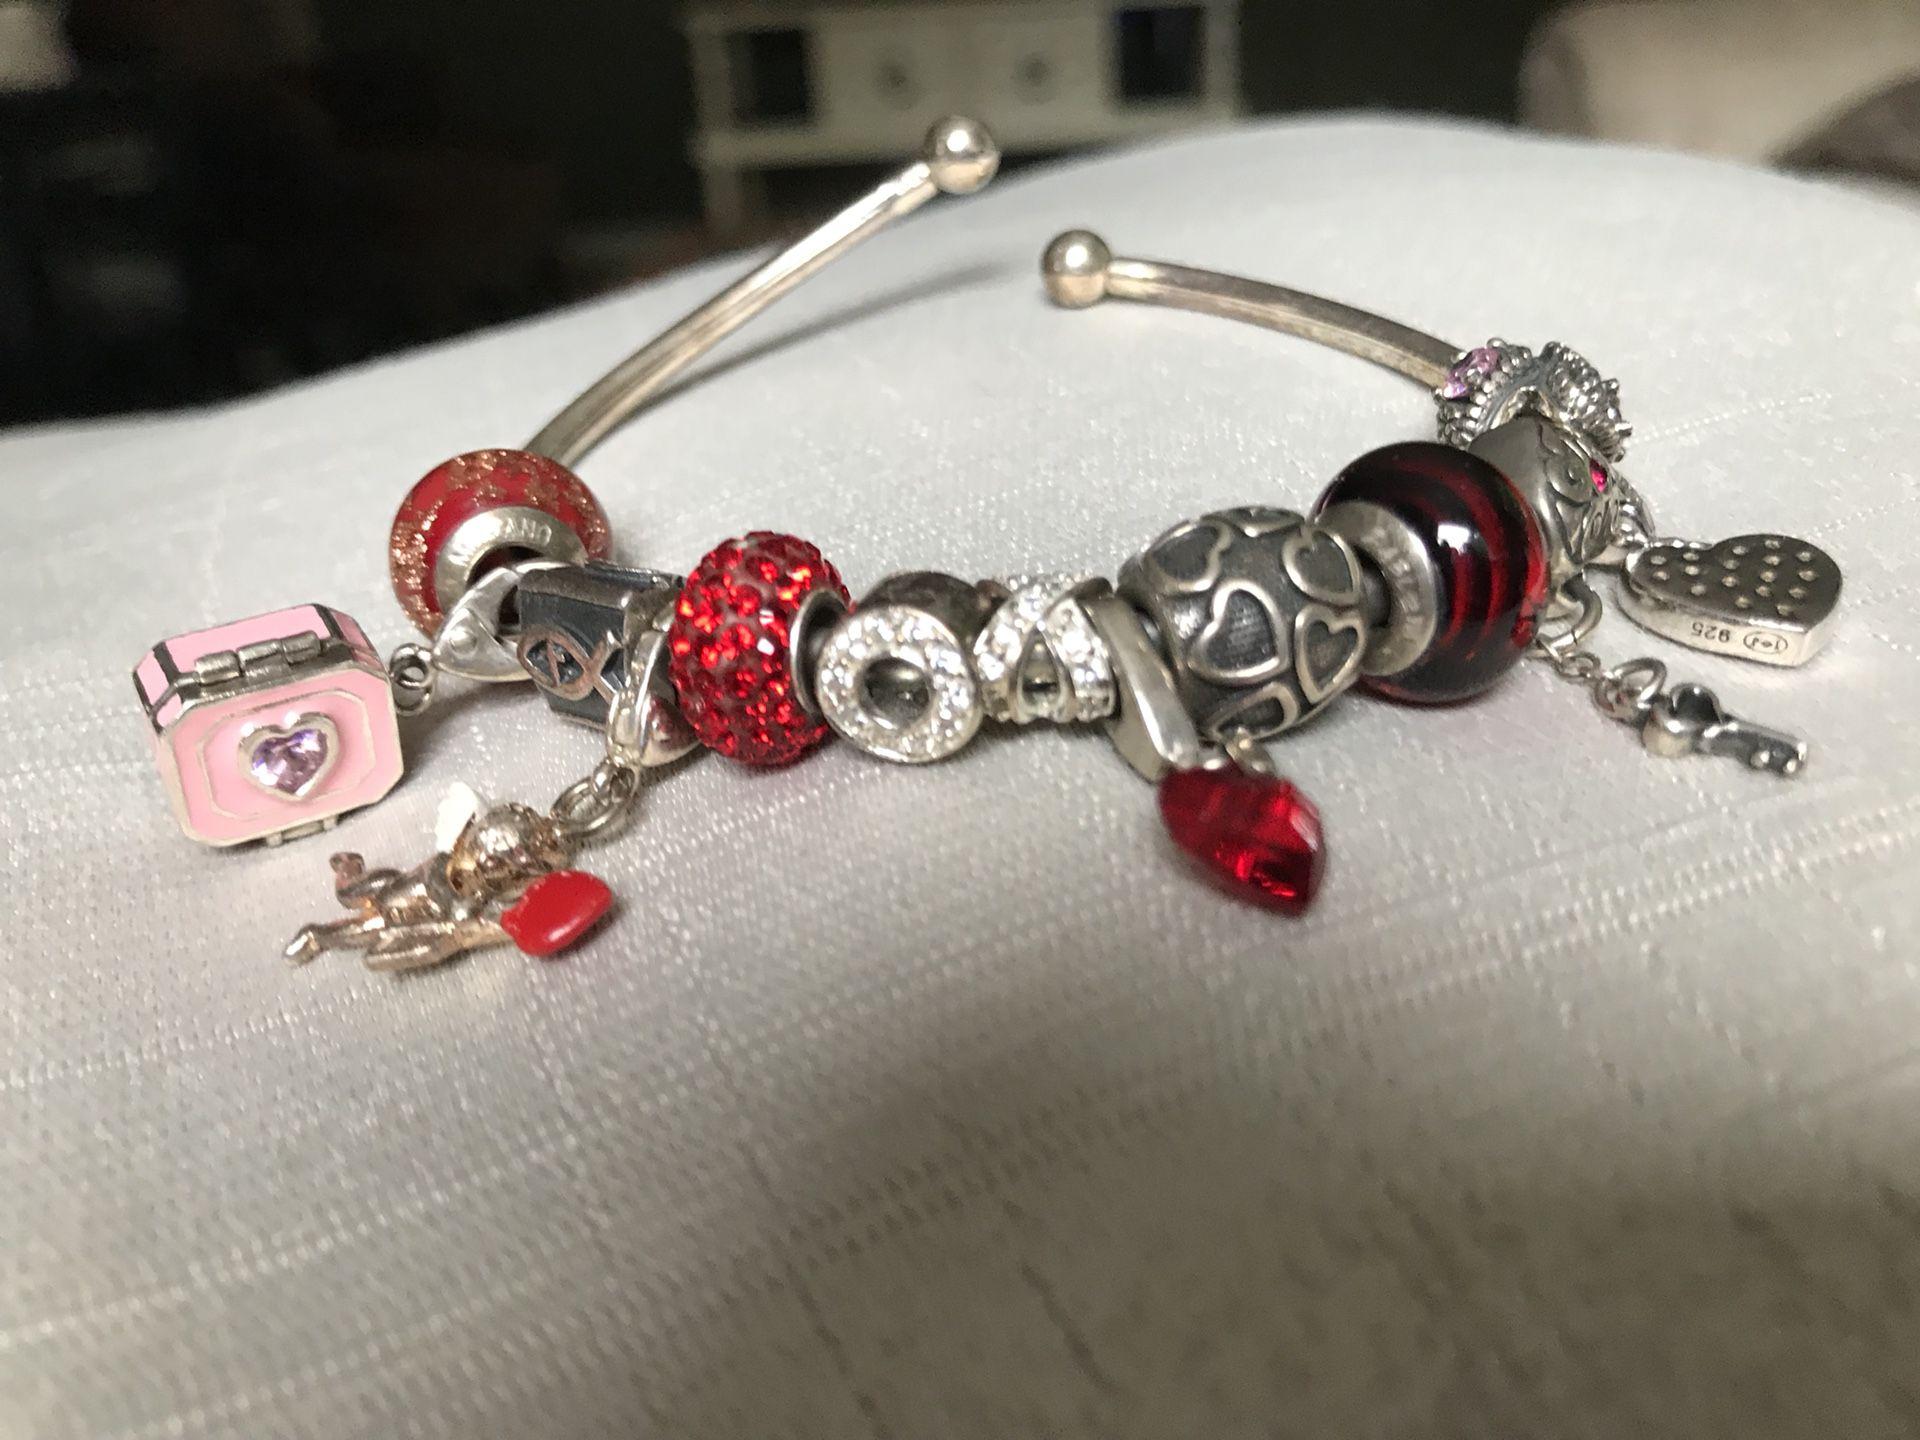 Sable bracelet